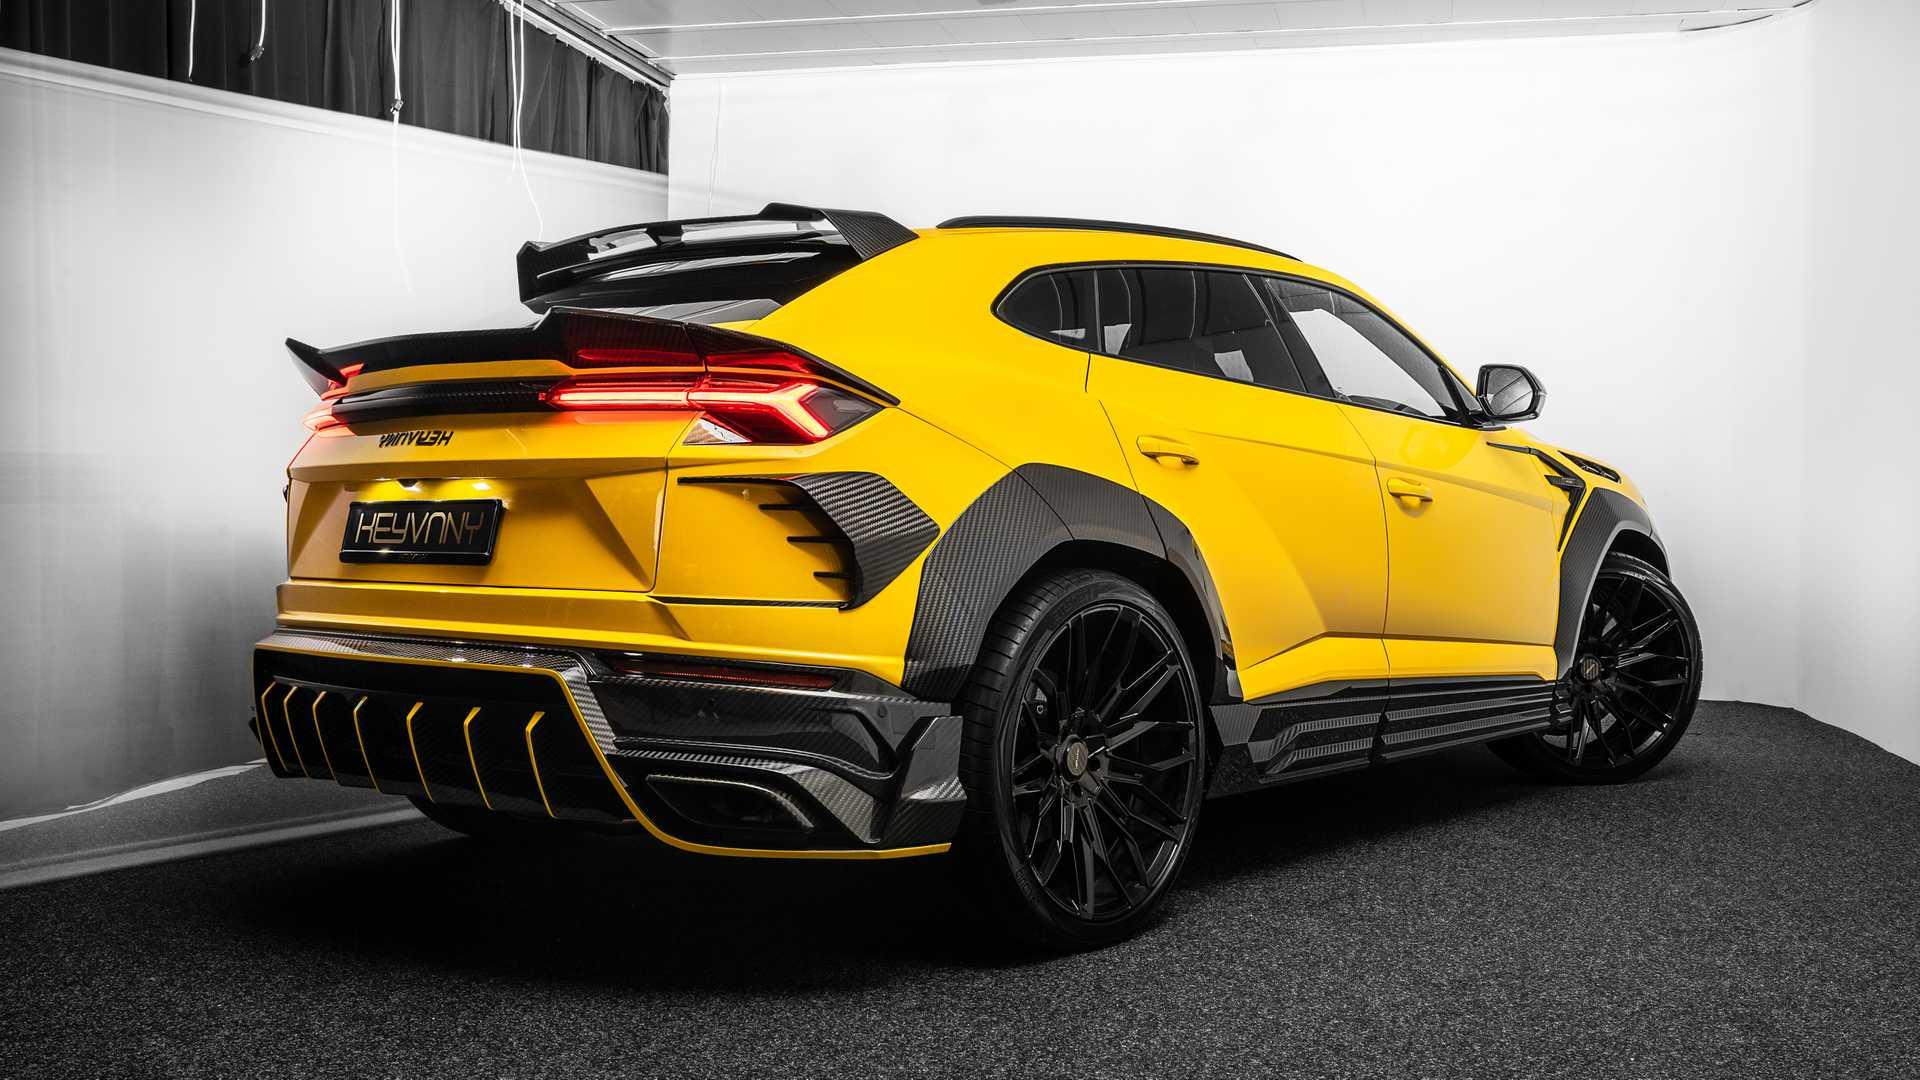 Lamborghini-Urus-by-Keyvany-5